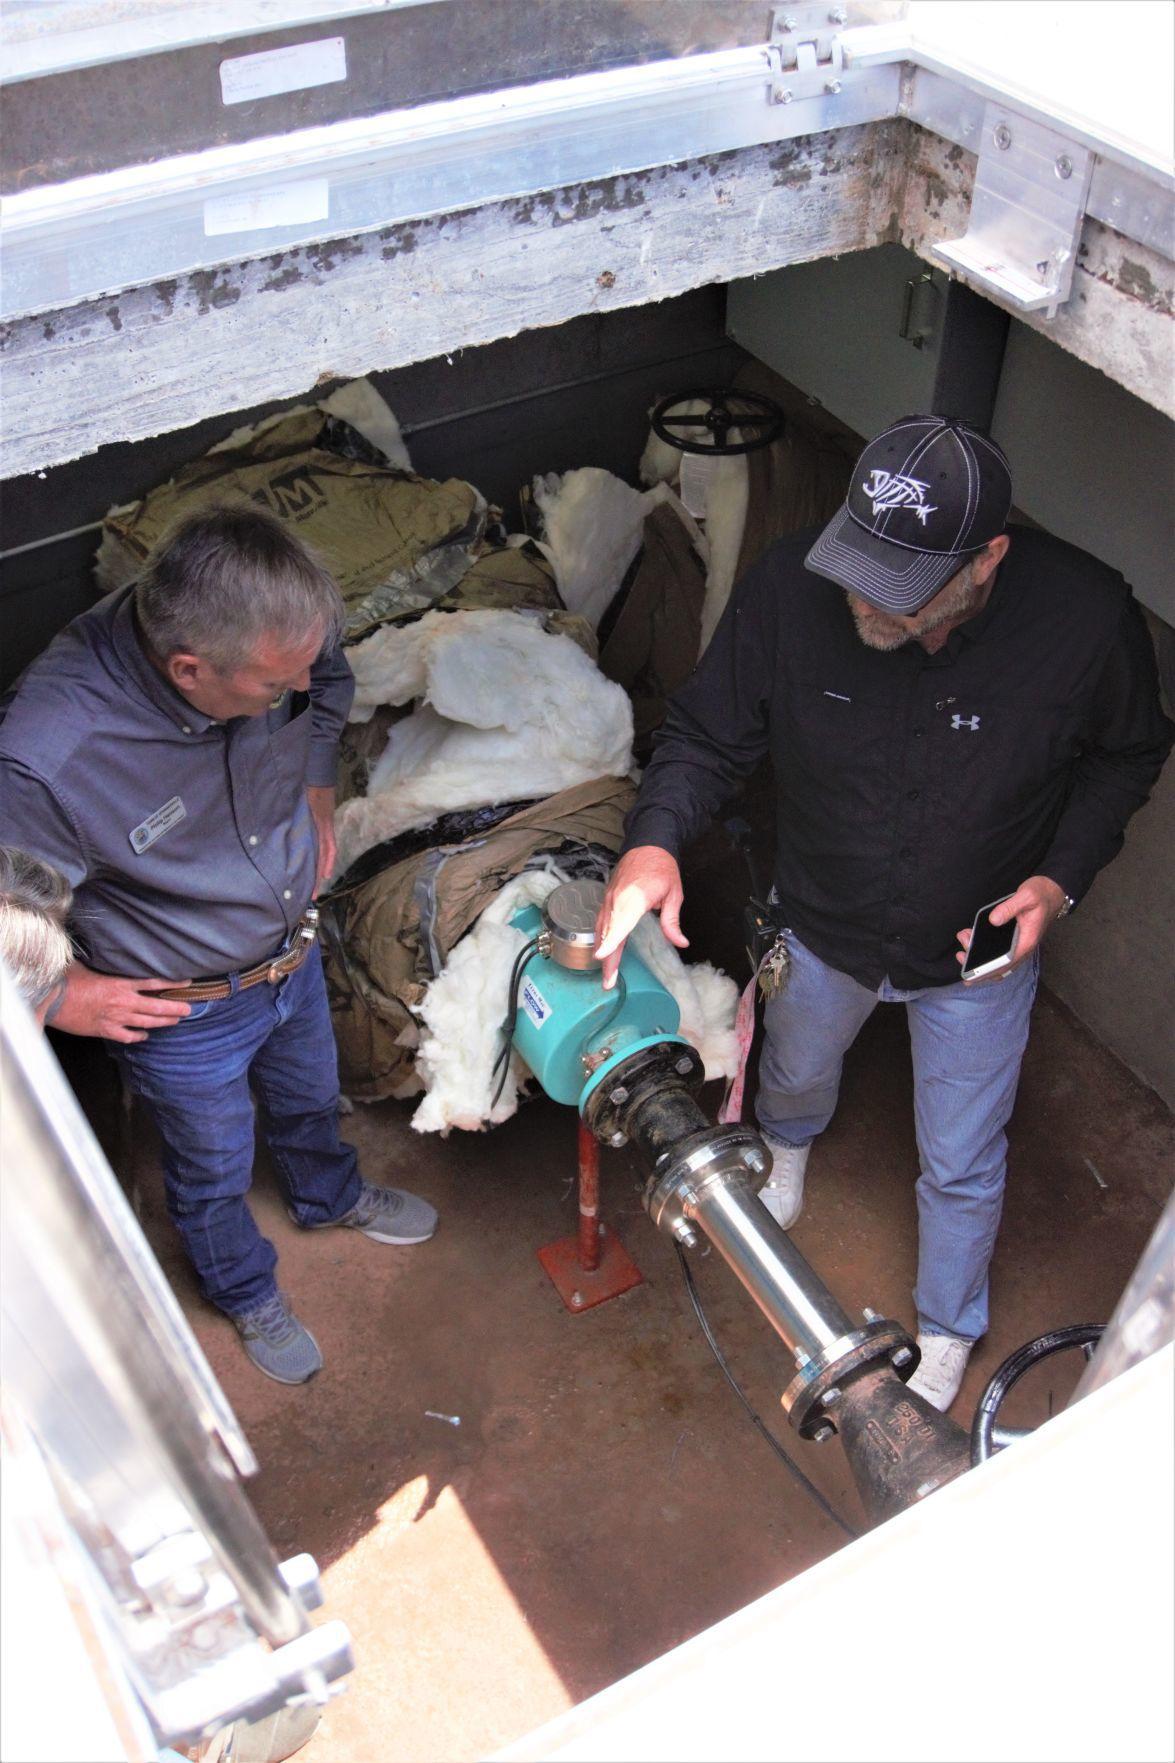 Inside the apparatus